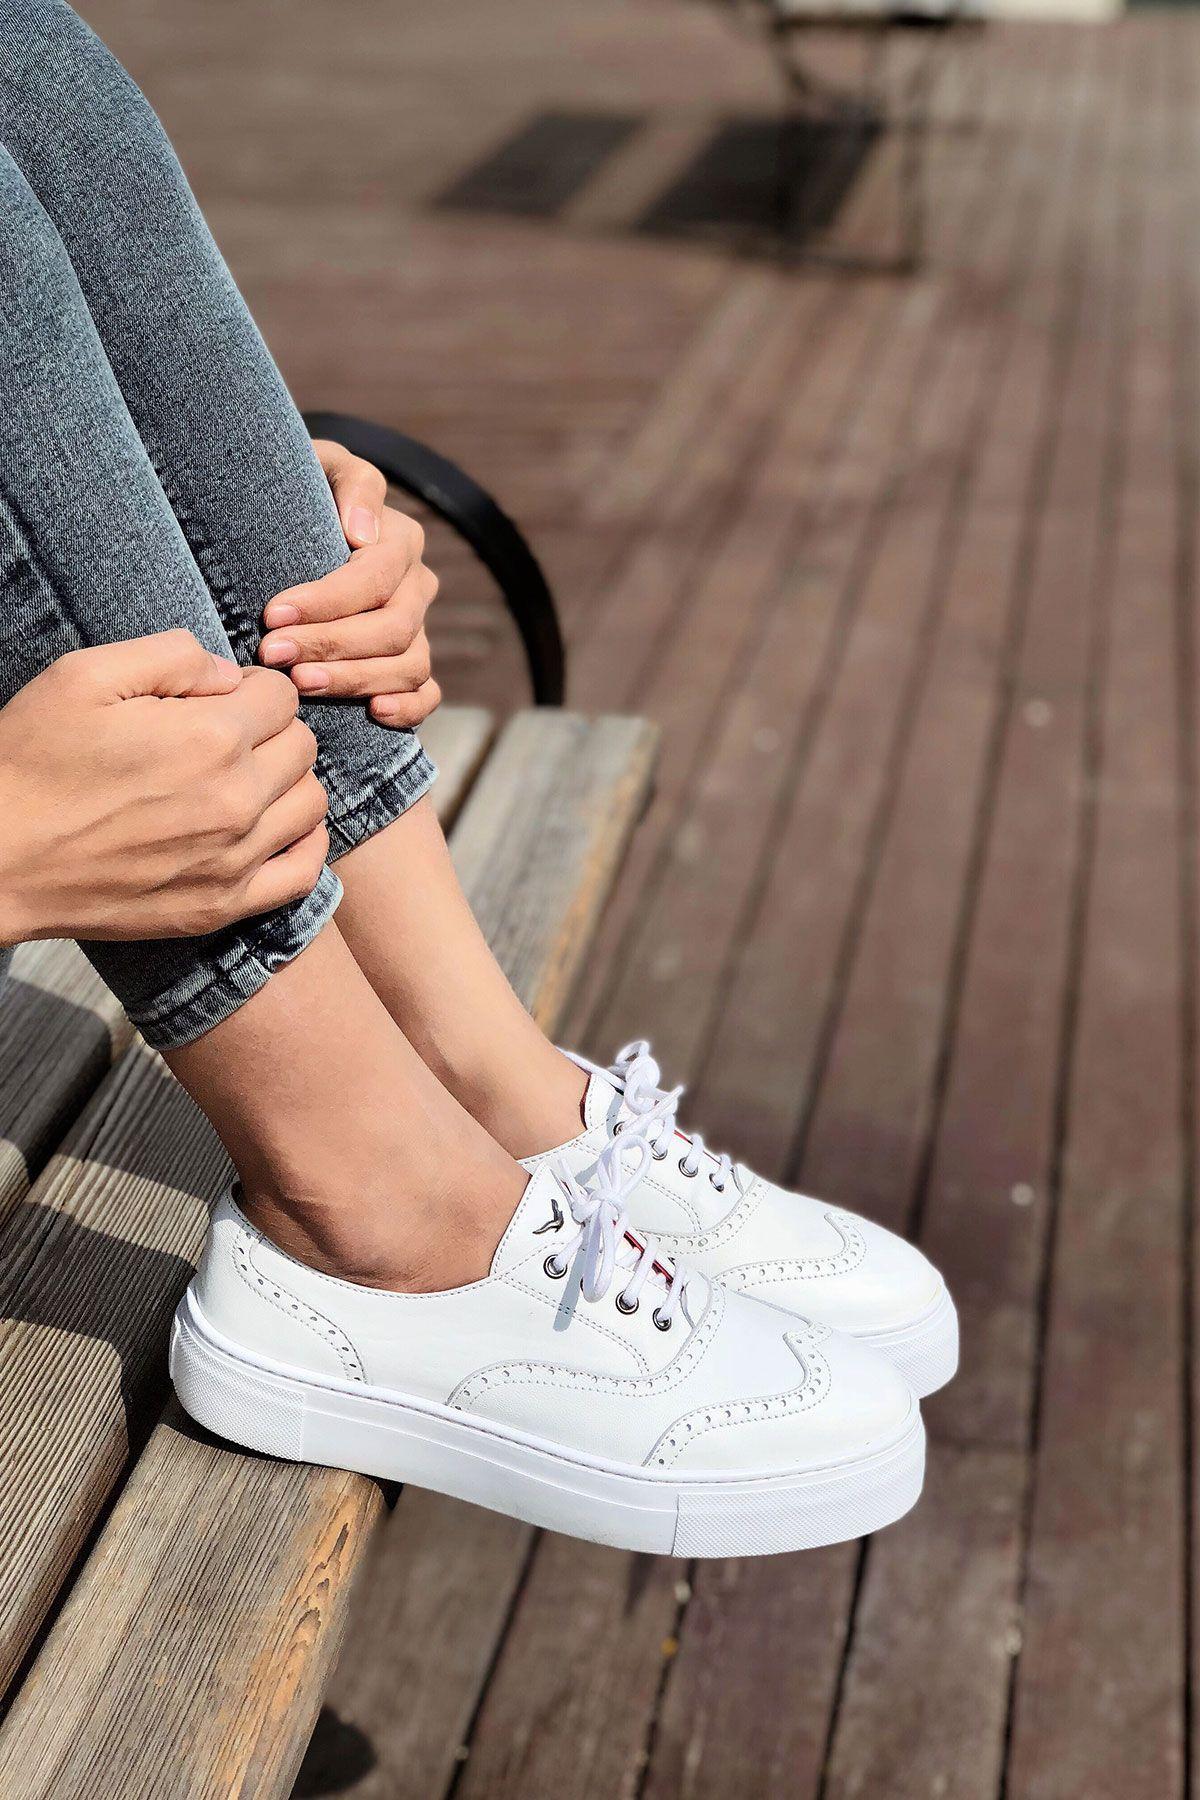 Pegia Chatalet Hakiki Deri Oxford Ayakkabı  Beyaz